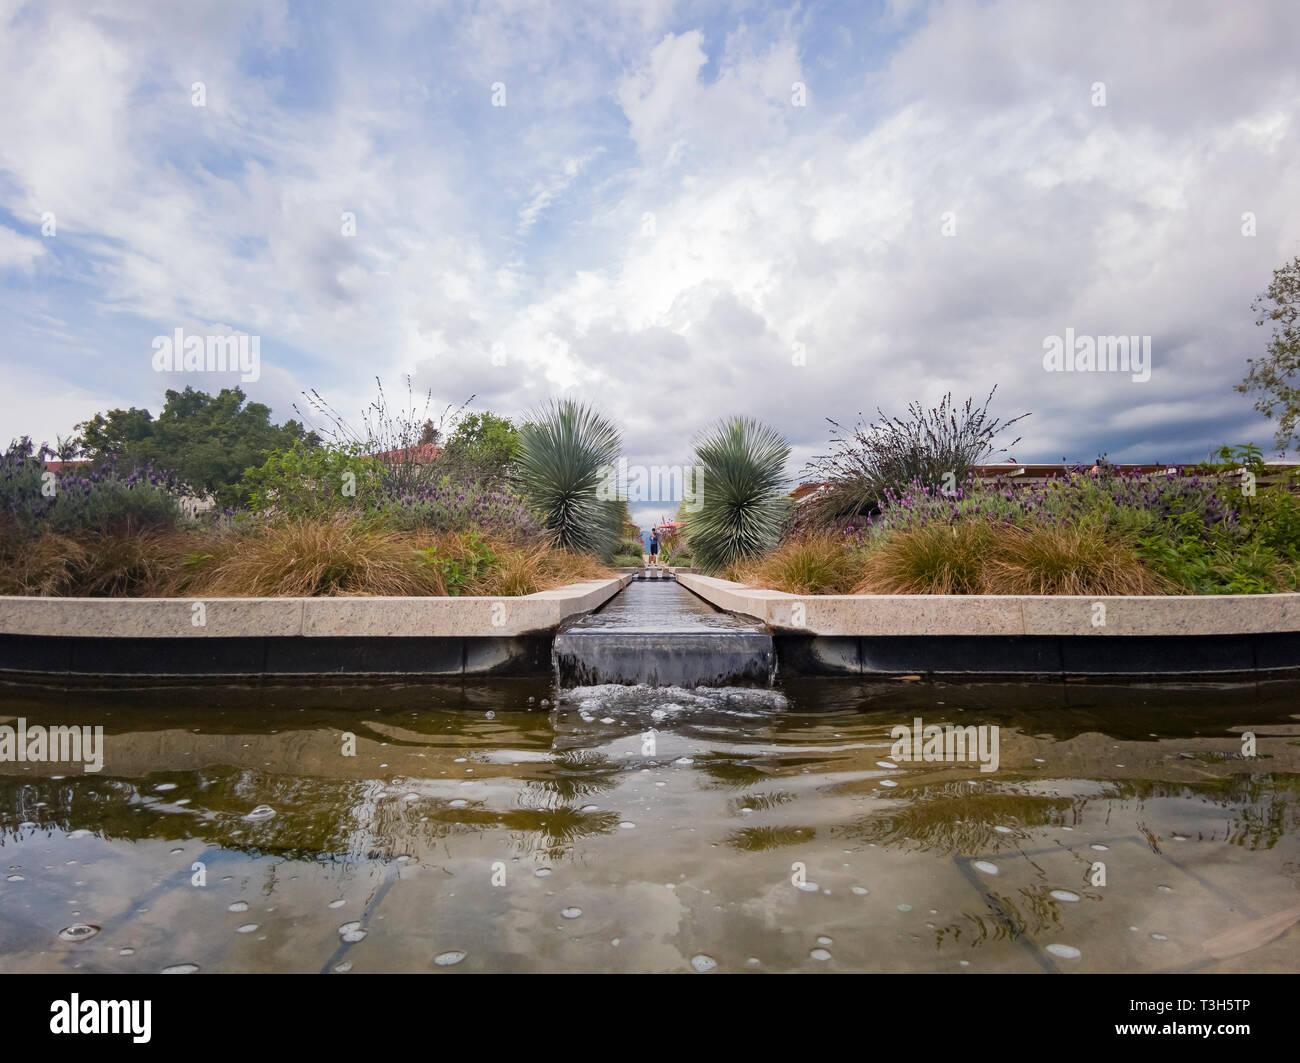 Natural scene around Huntington Library at Los Angeles, California - Stock Image